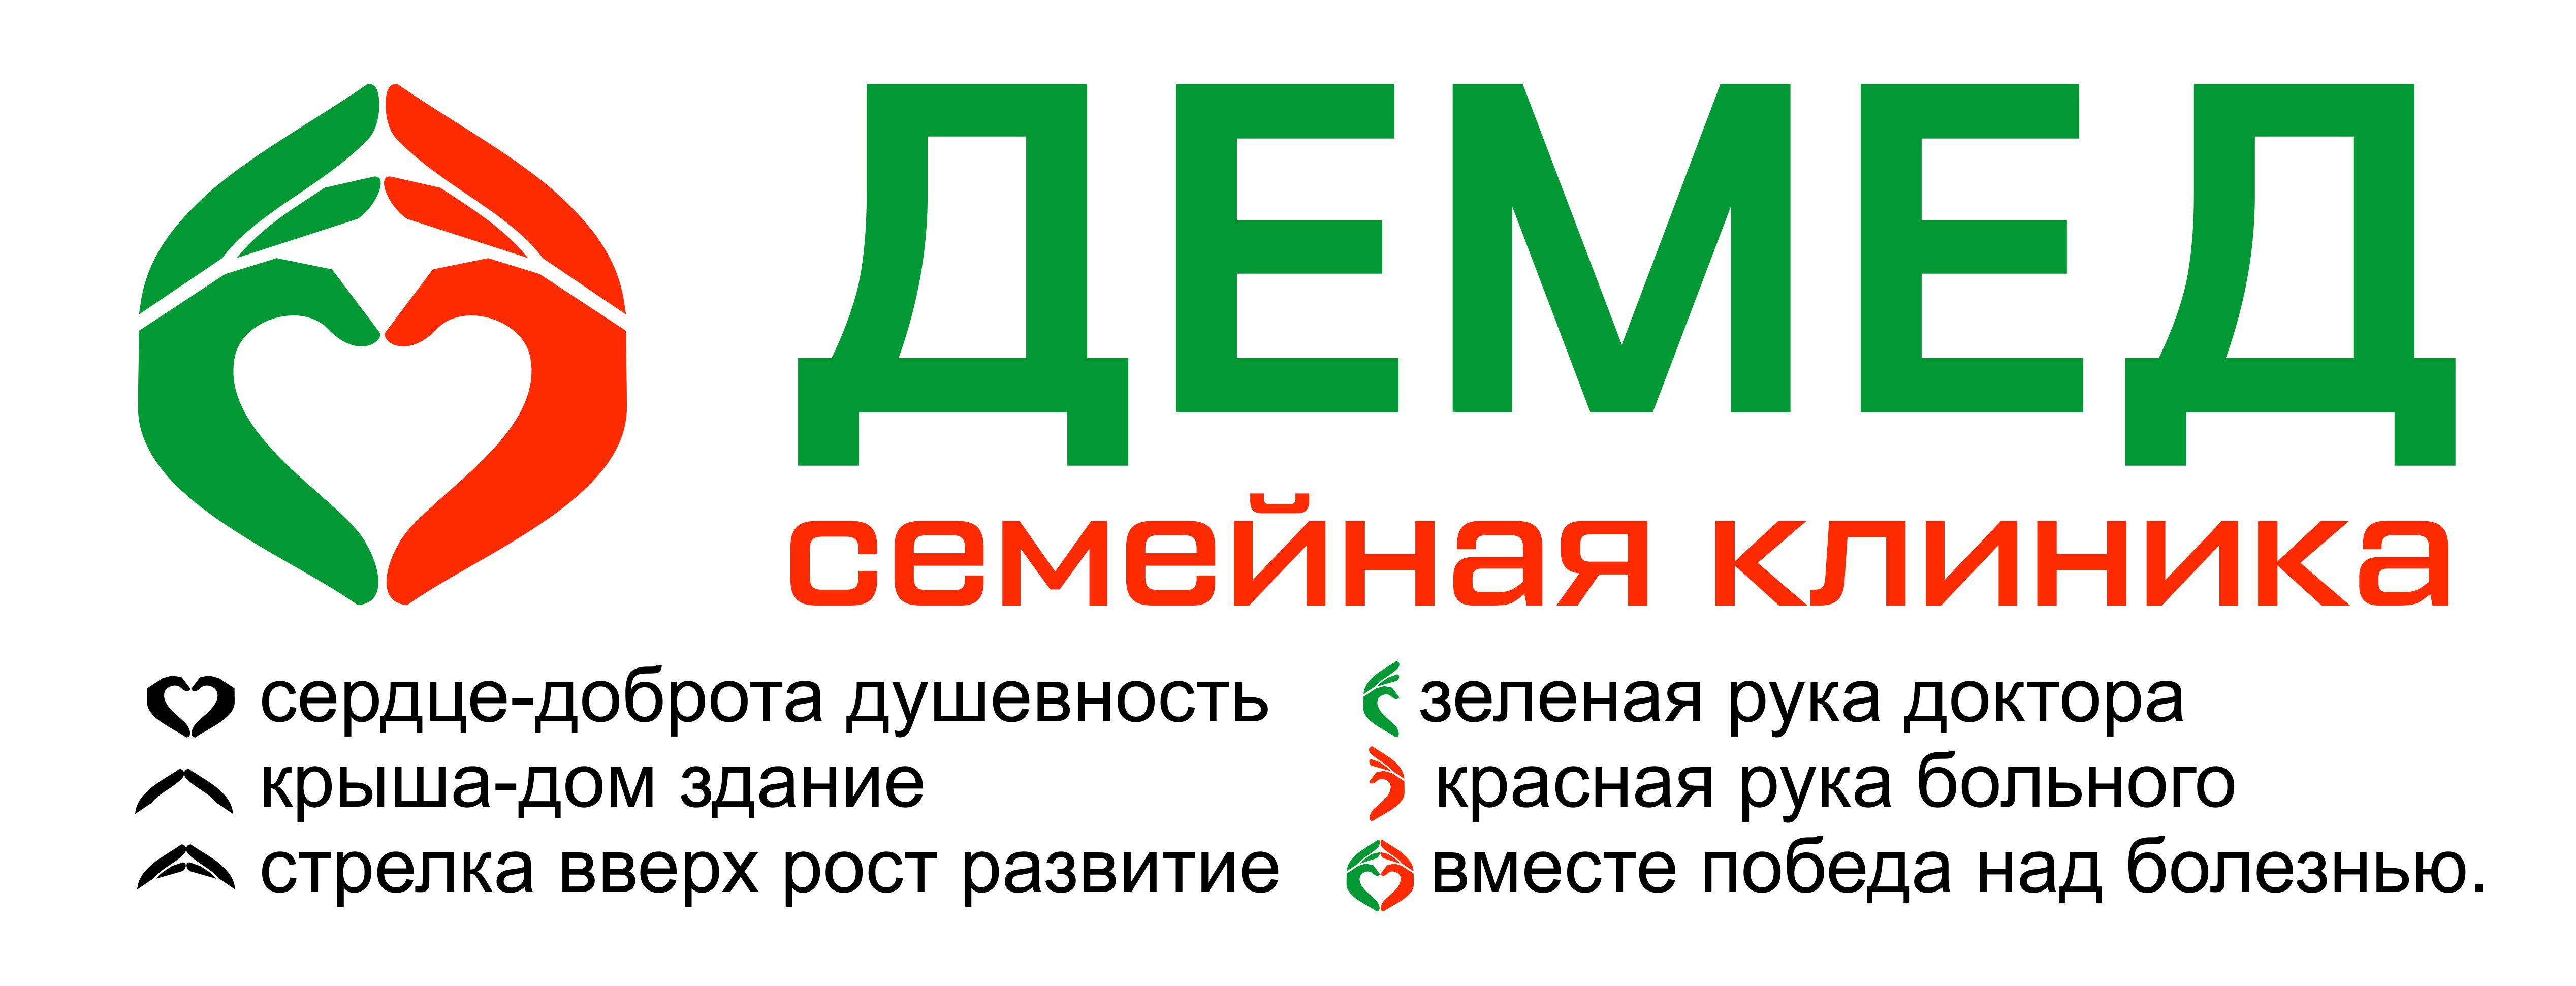 Логотип медицинского центра фото f_0395dcdcfe6398b2.jpg